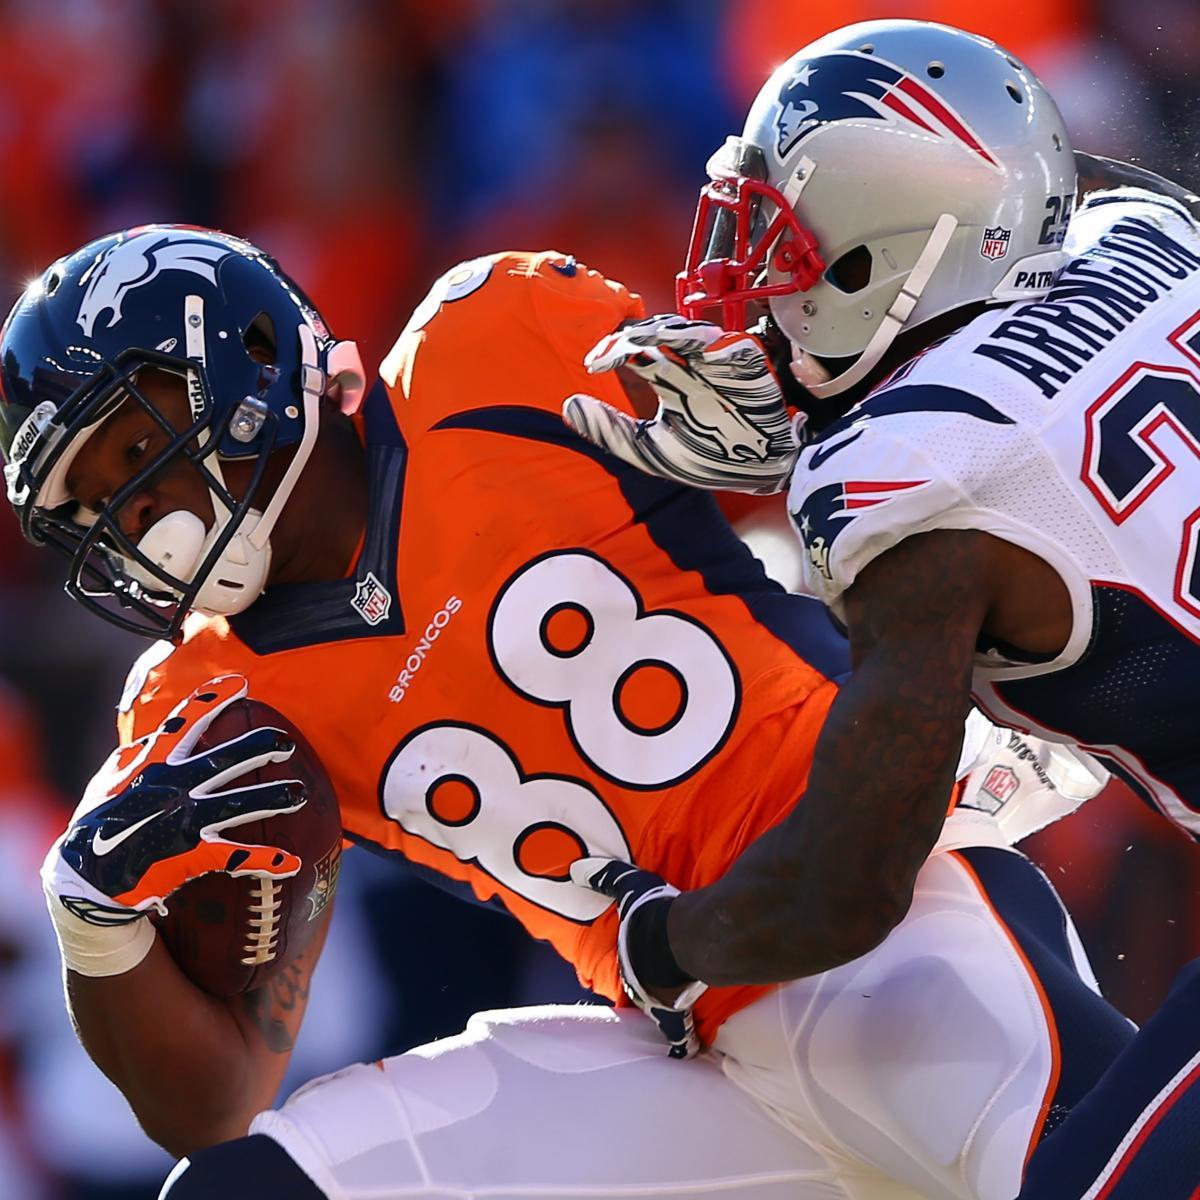 The Latest Denver Broncos News Bleacher Report: Denver Broncos Vs. New England Patriots: Complete Week 9